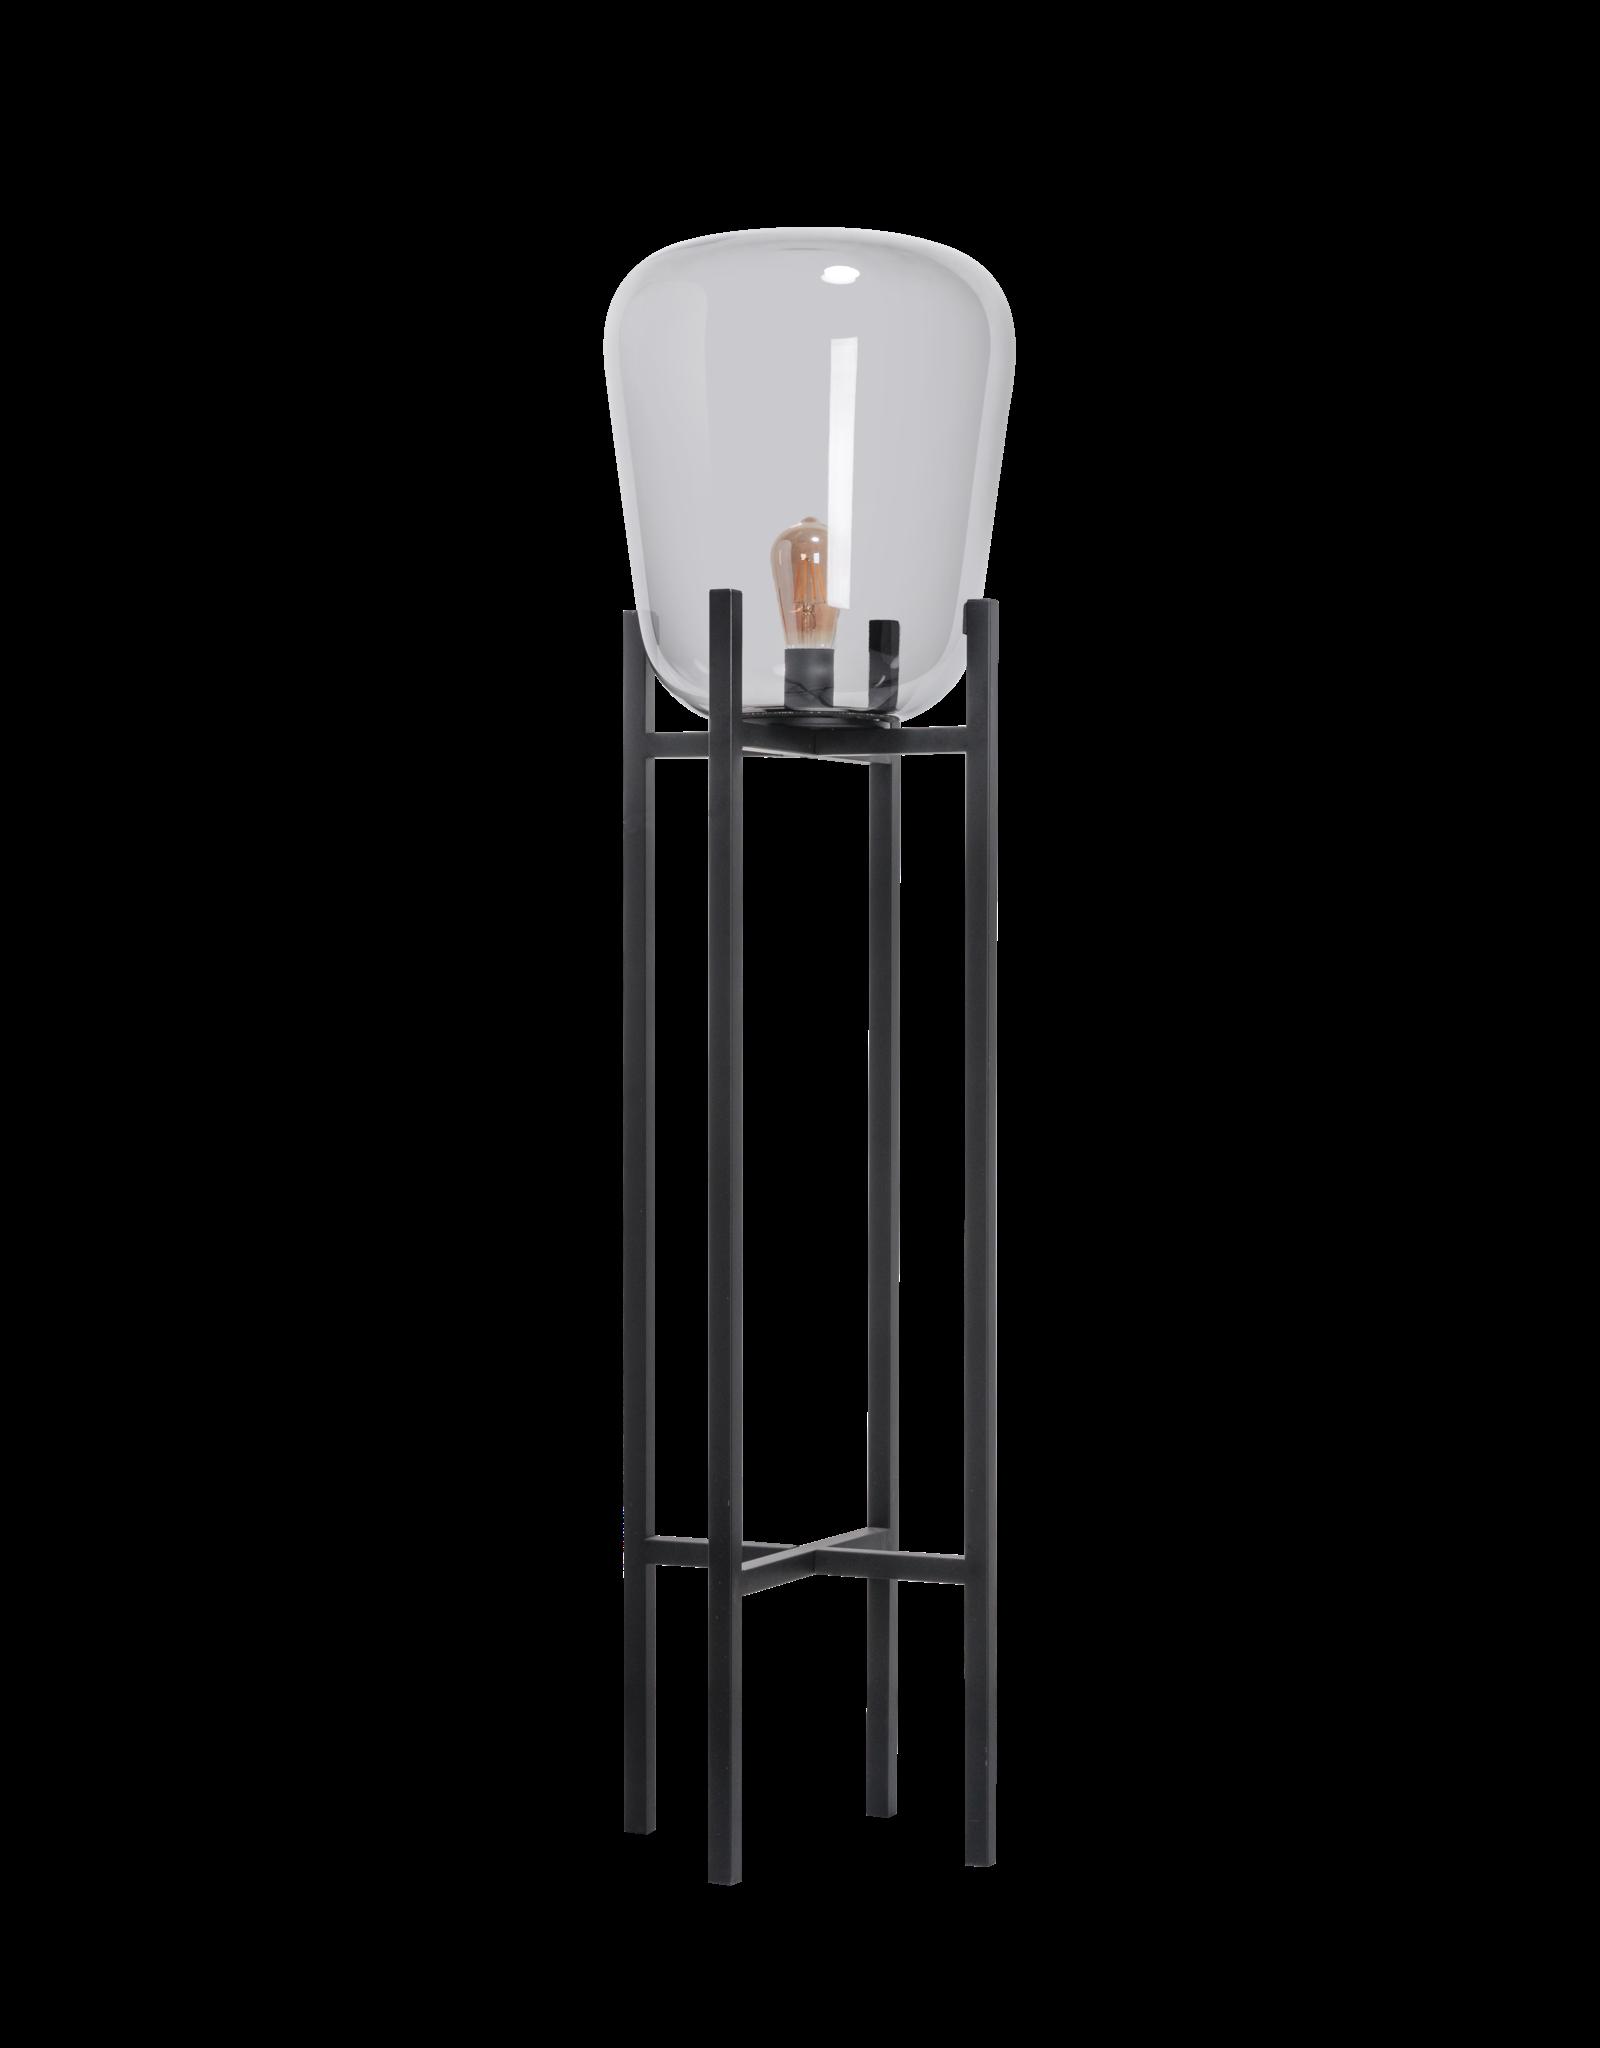 Benn Original VLOERLAMP 1x E27 zwart / gun metal glas D33 H115cm (2 DOZEN)